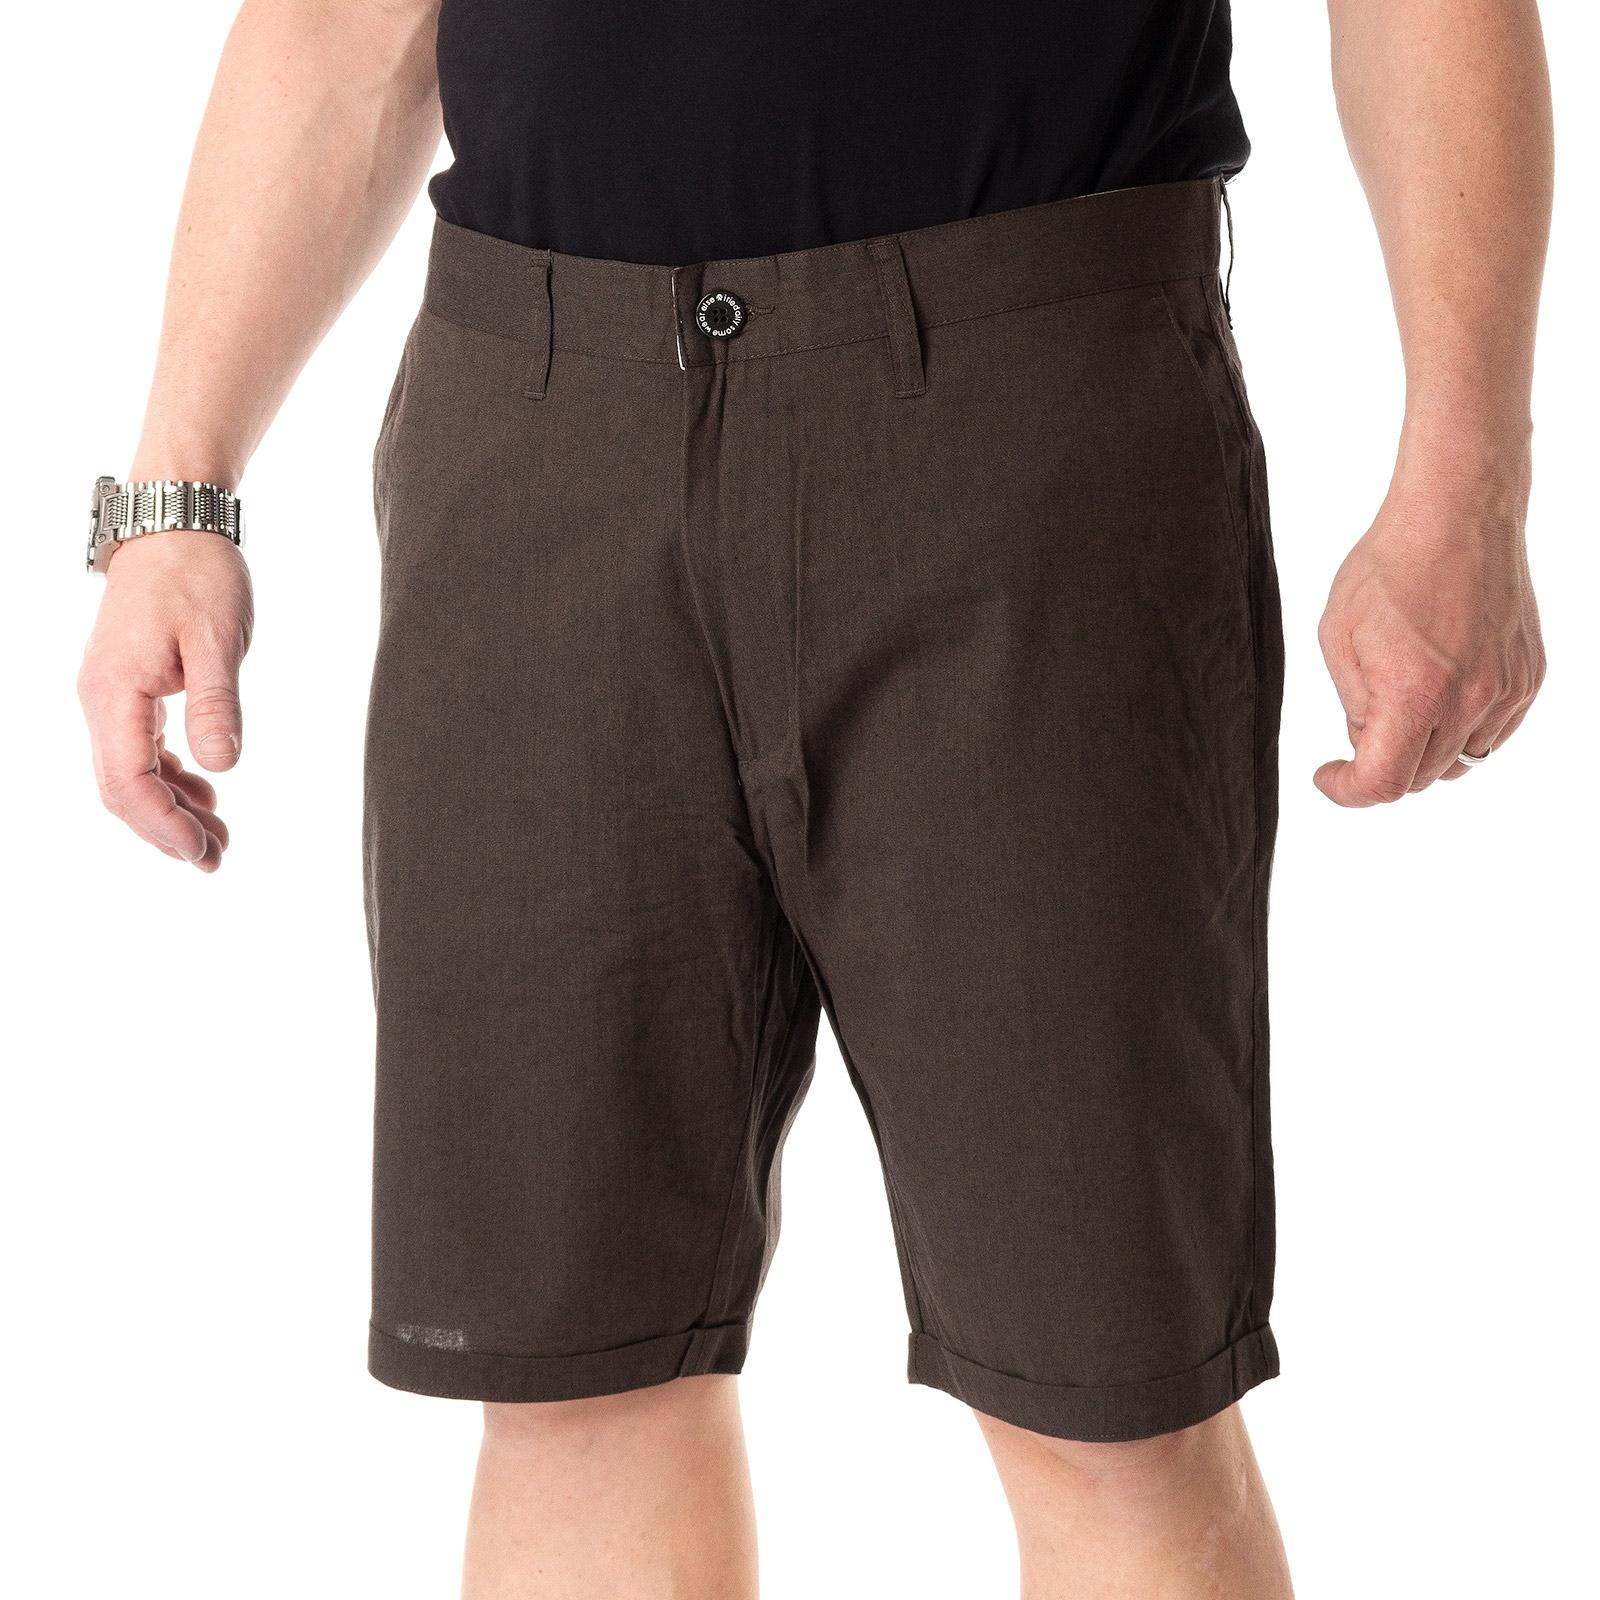 Iriedaily-Golfista-Chambray-Pantalones-cortos-hombre-pantalon-corto-DIFERENTES